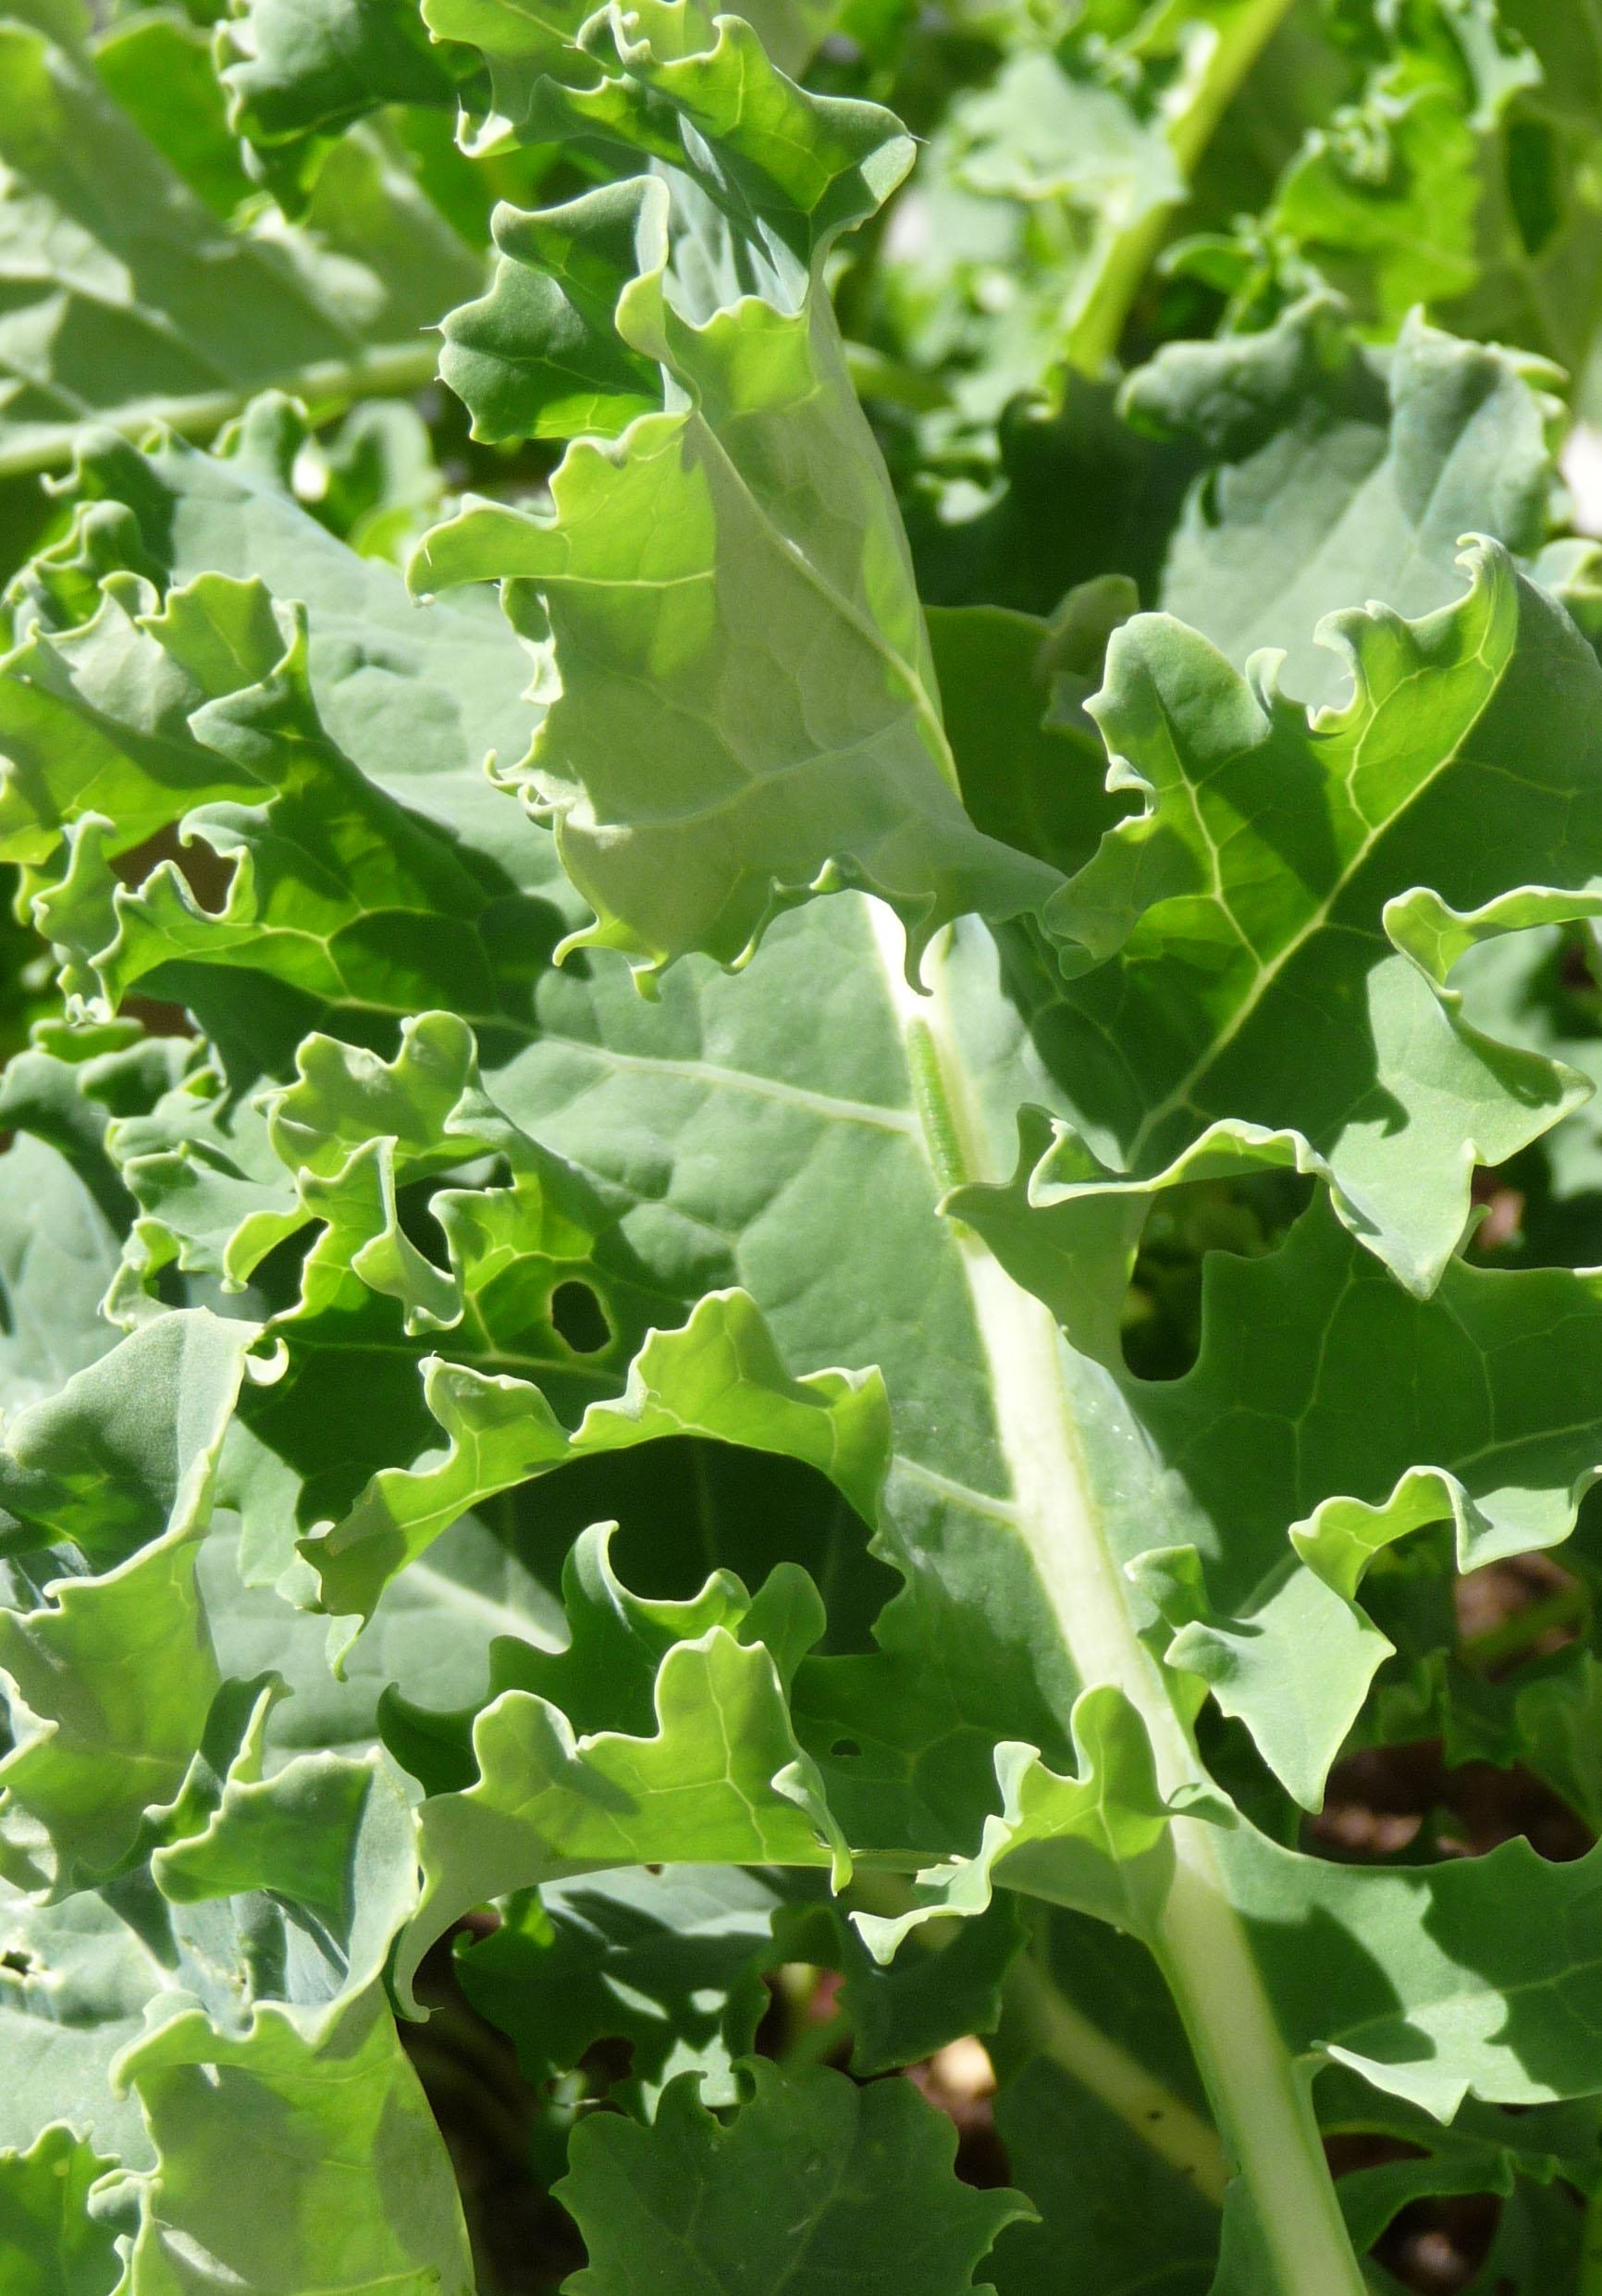 Kale Leaves (c) jfhaugen